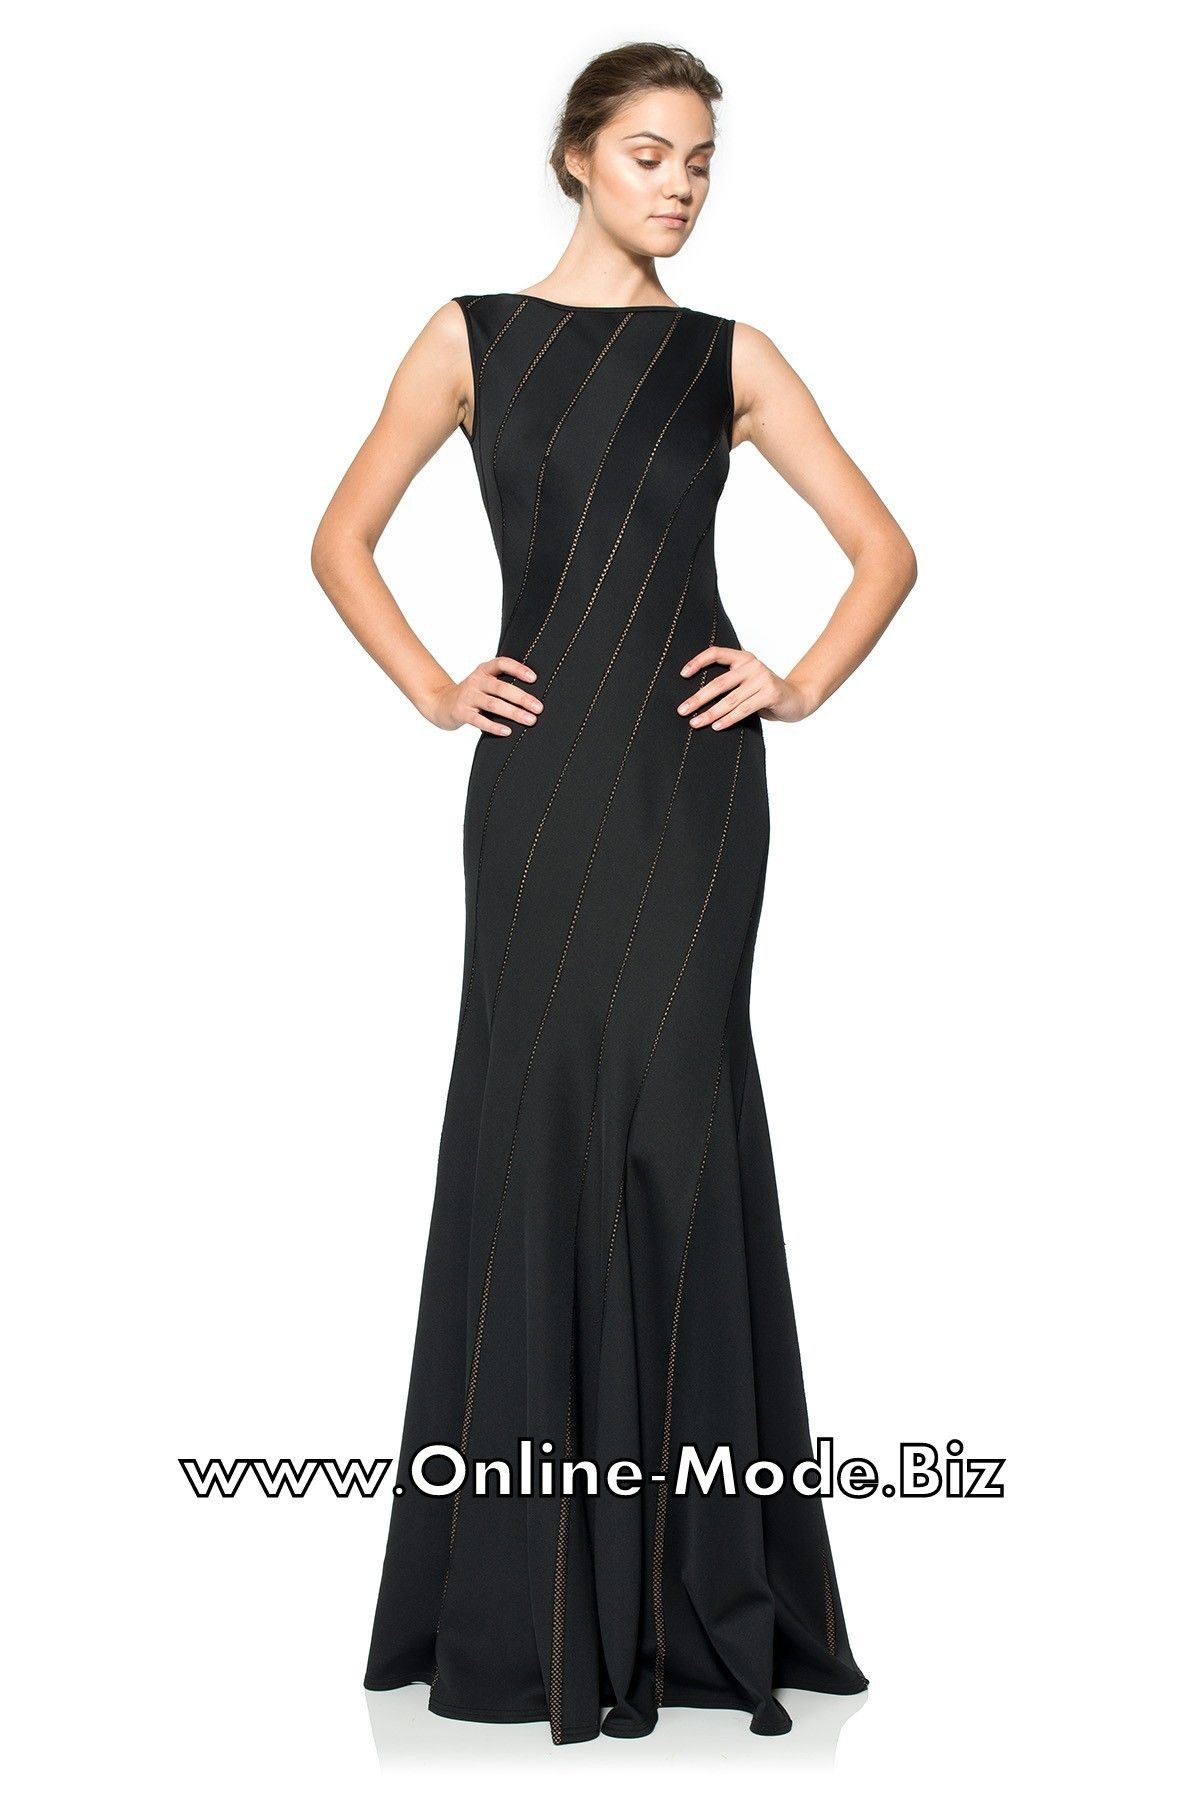 schwarzes abendkleid wanda bodenlang | bodenlange kleider